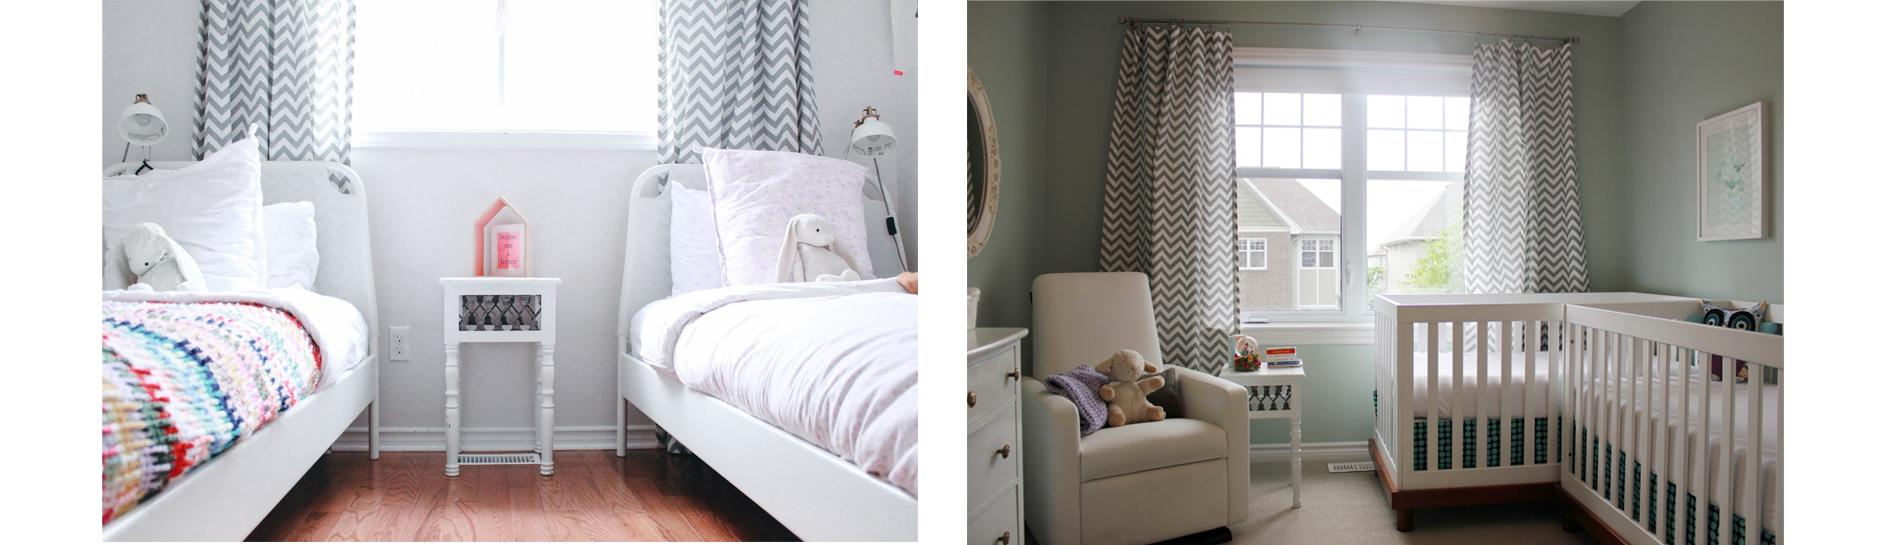 twin nursery and twin bedroom